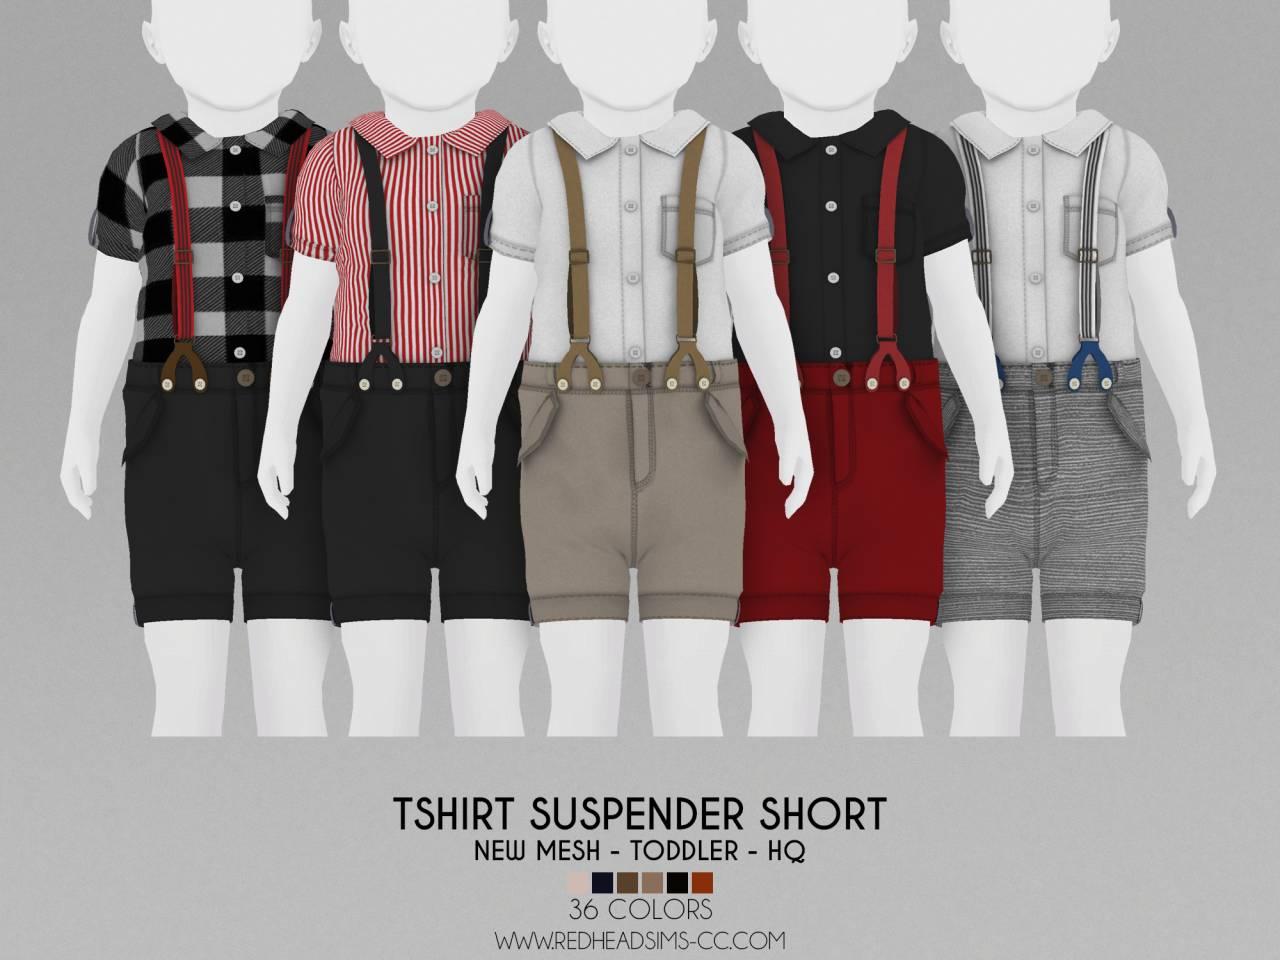 Рубашка и шорты для малышей - TODDLER TSHIRT SUSPENDER SHORT